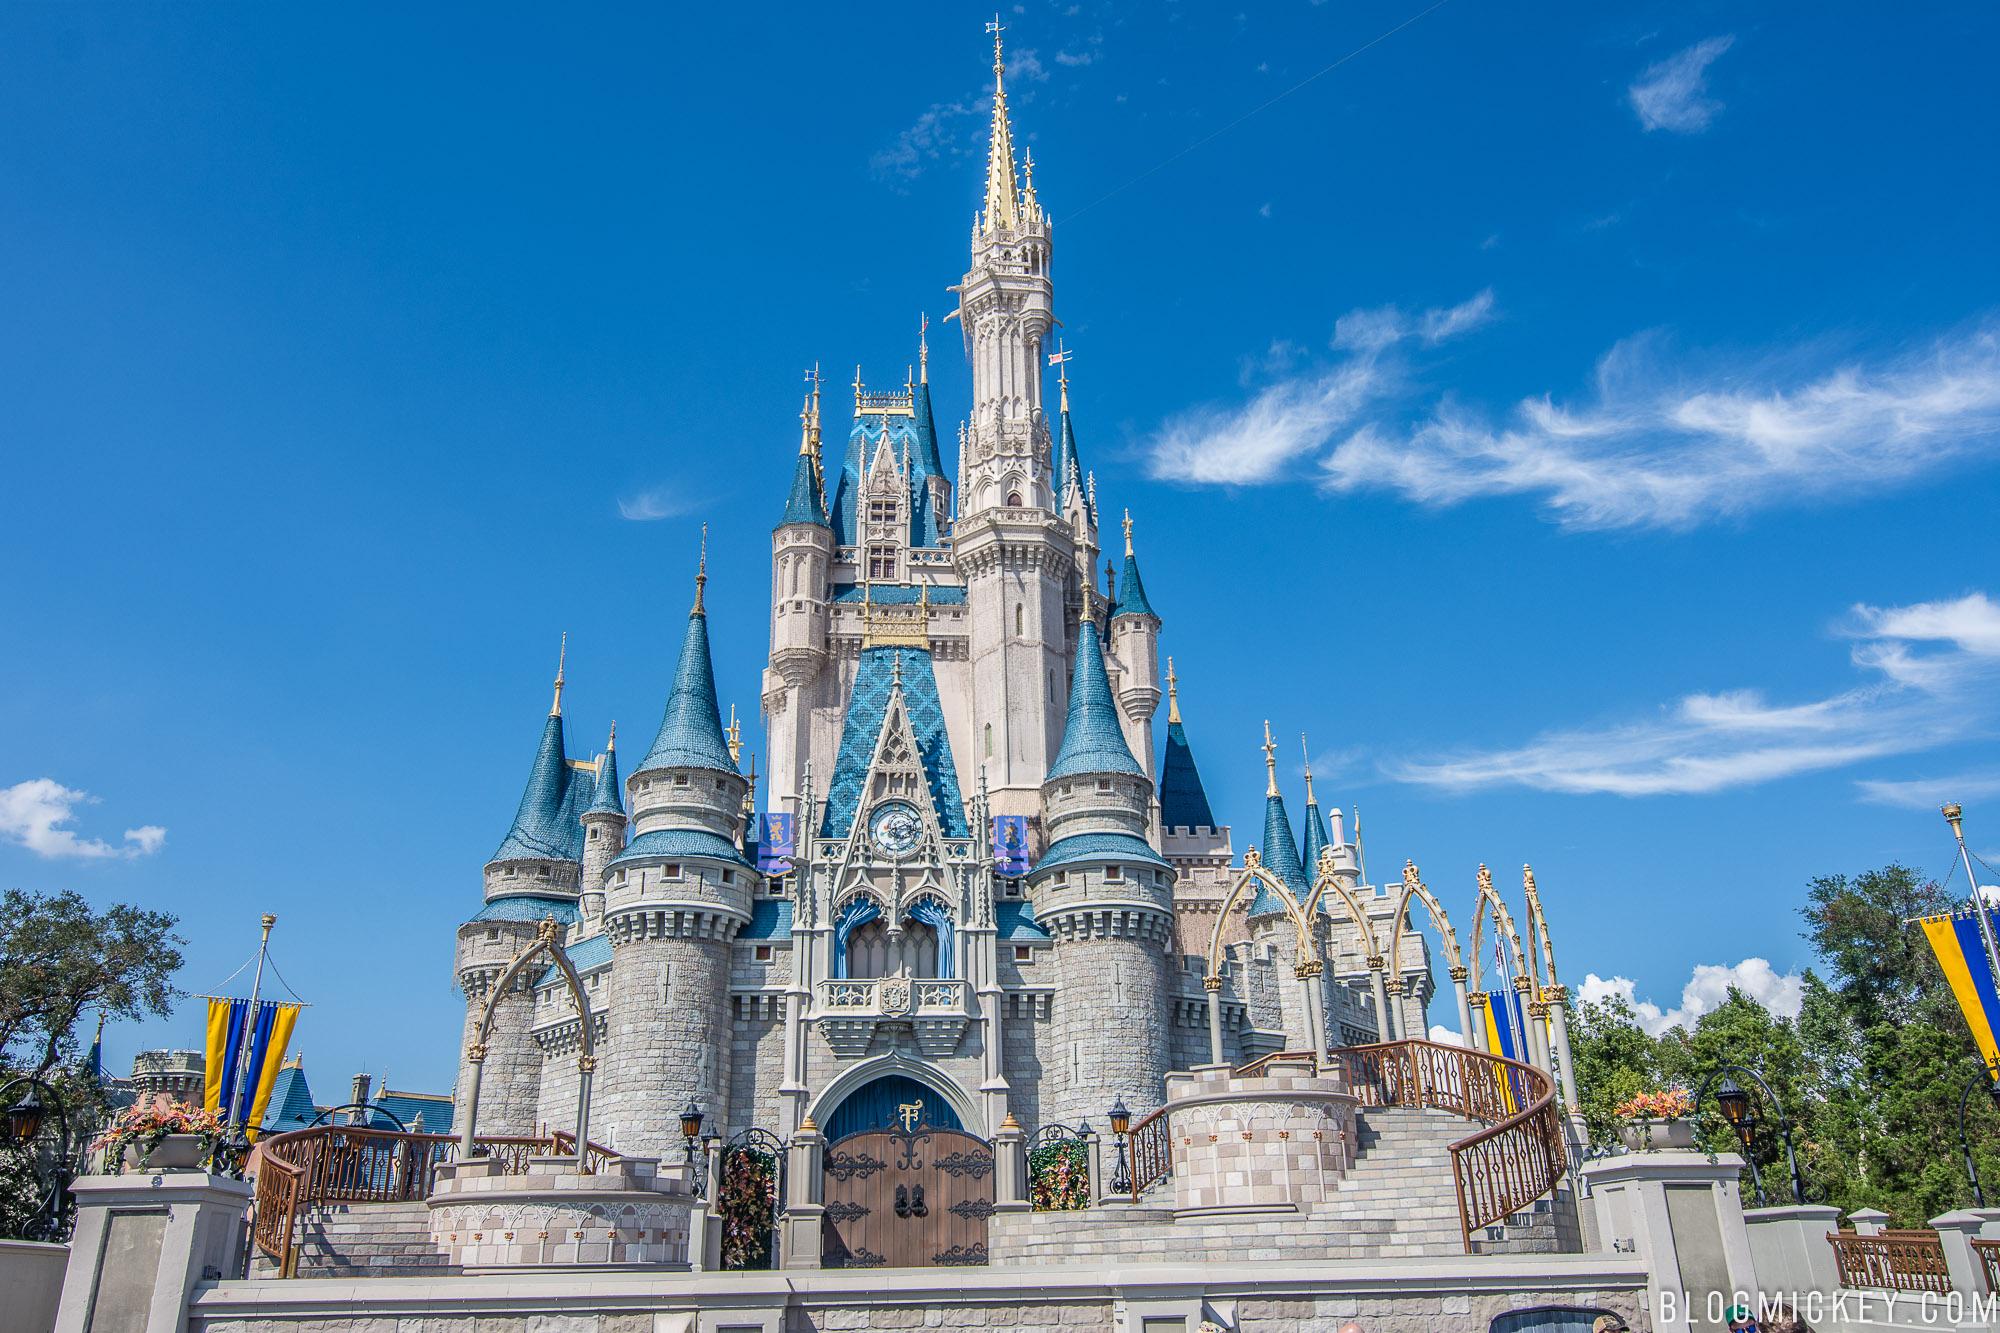 photos cinderella castle dreamlights installation underway at magic